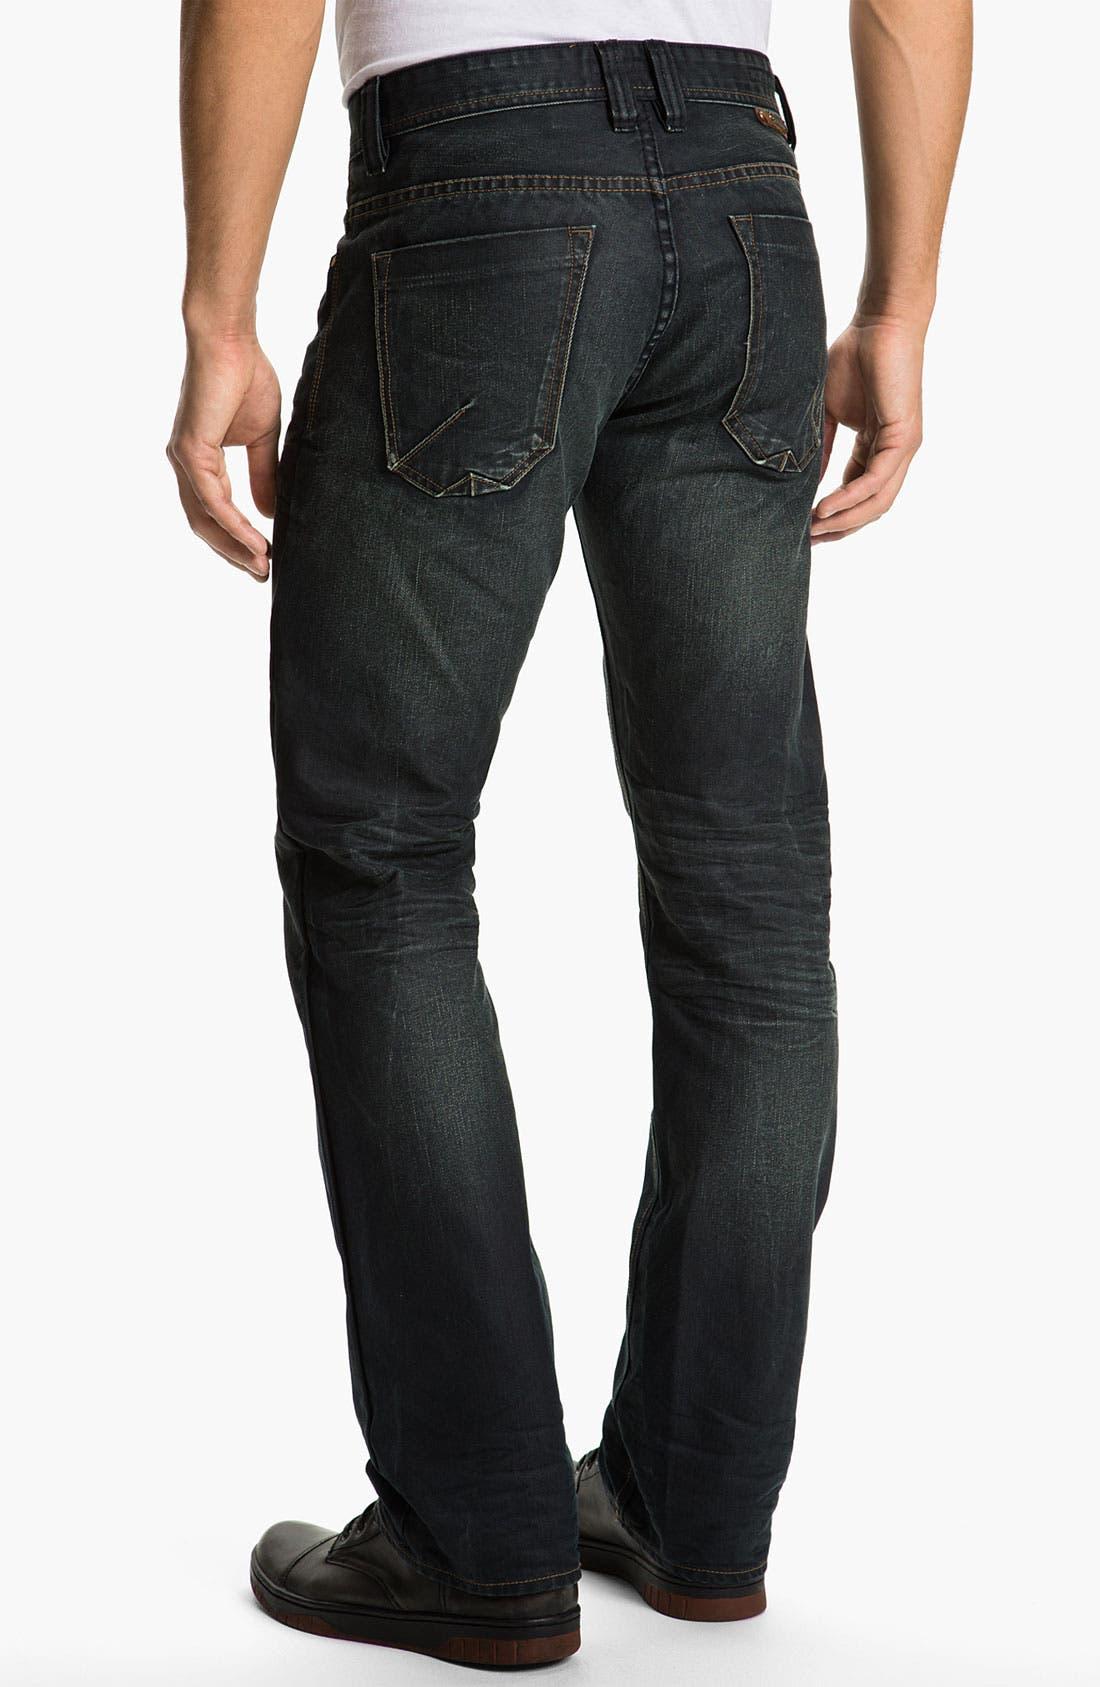 Main Image - Projek Raw Relaxed Straight Leg Jeans (Dark Blue)